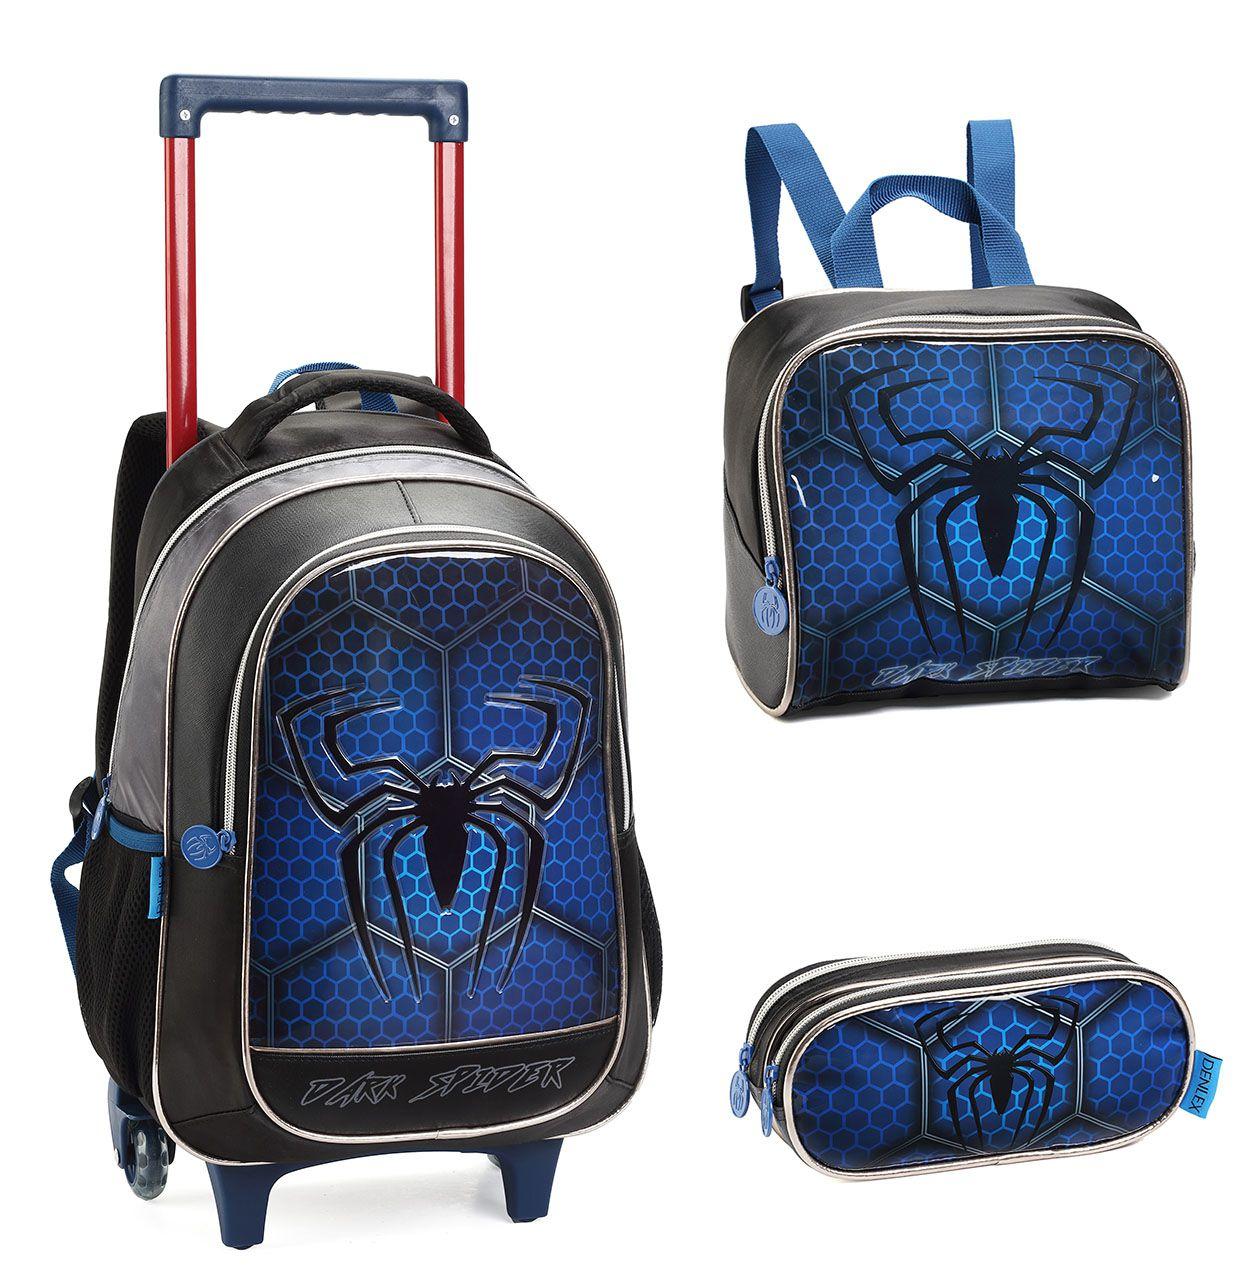 Kit Mochila Escolar Infantil Masculino Dark Spider 0625 Azul